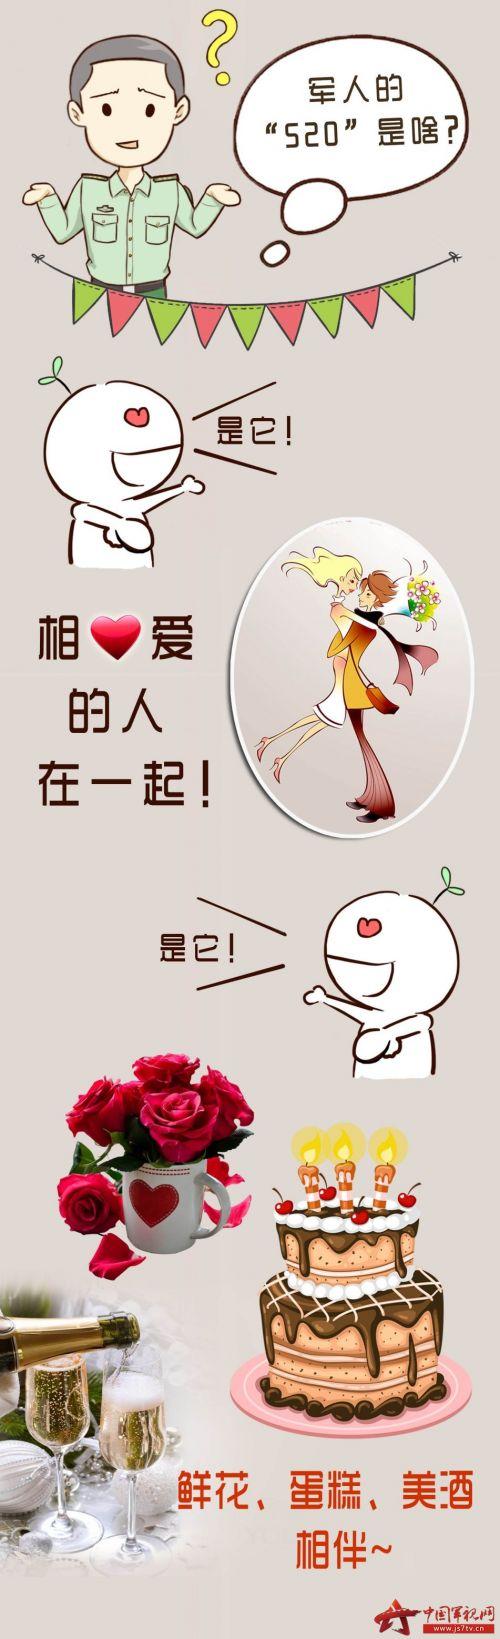 http://files.js7tv.cn/www/images/2016-05/19/1463652742472596_raw.jpg